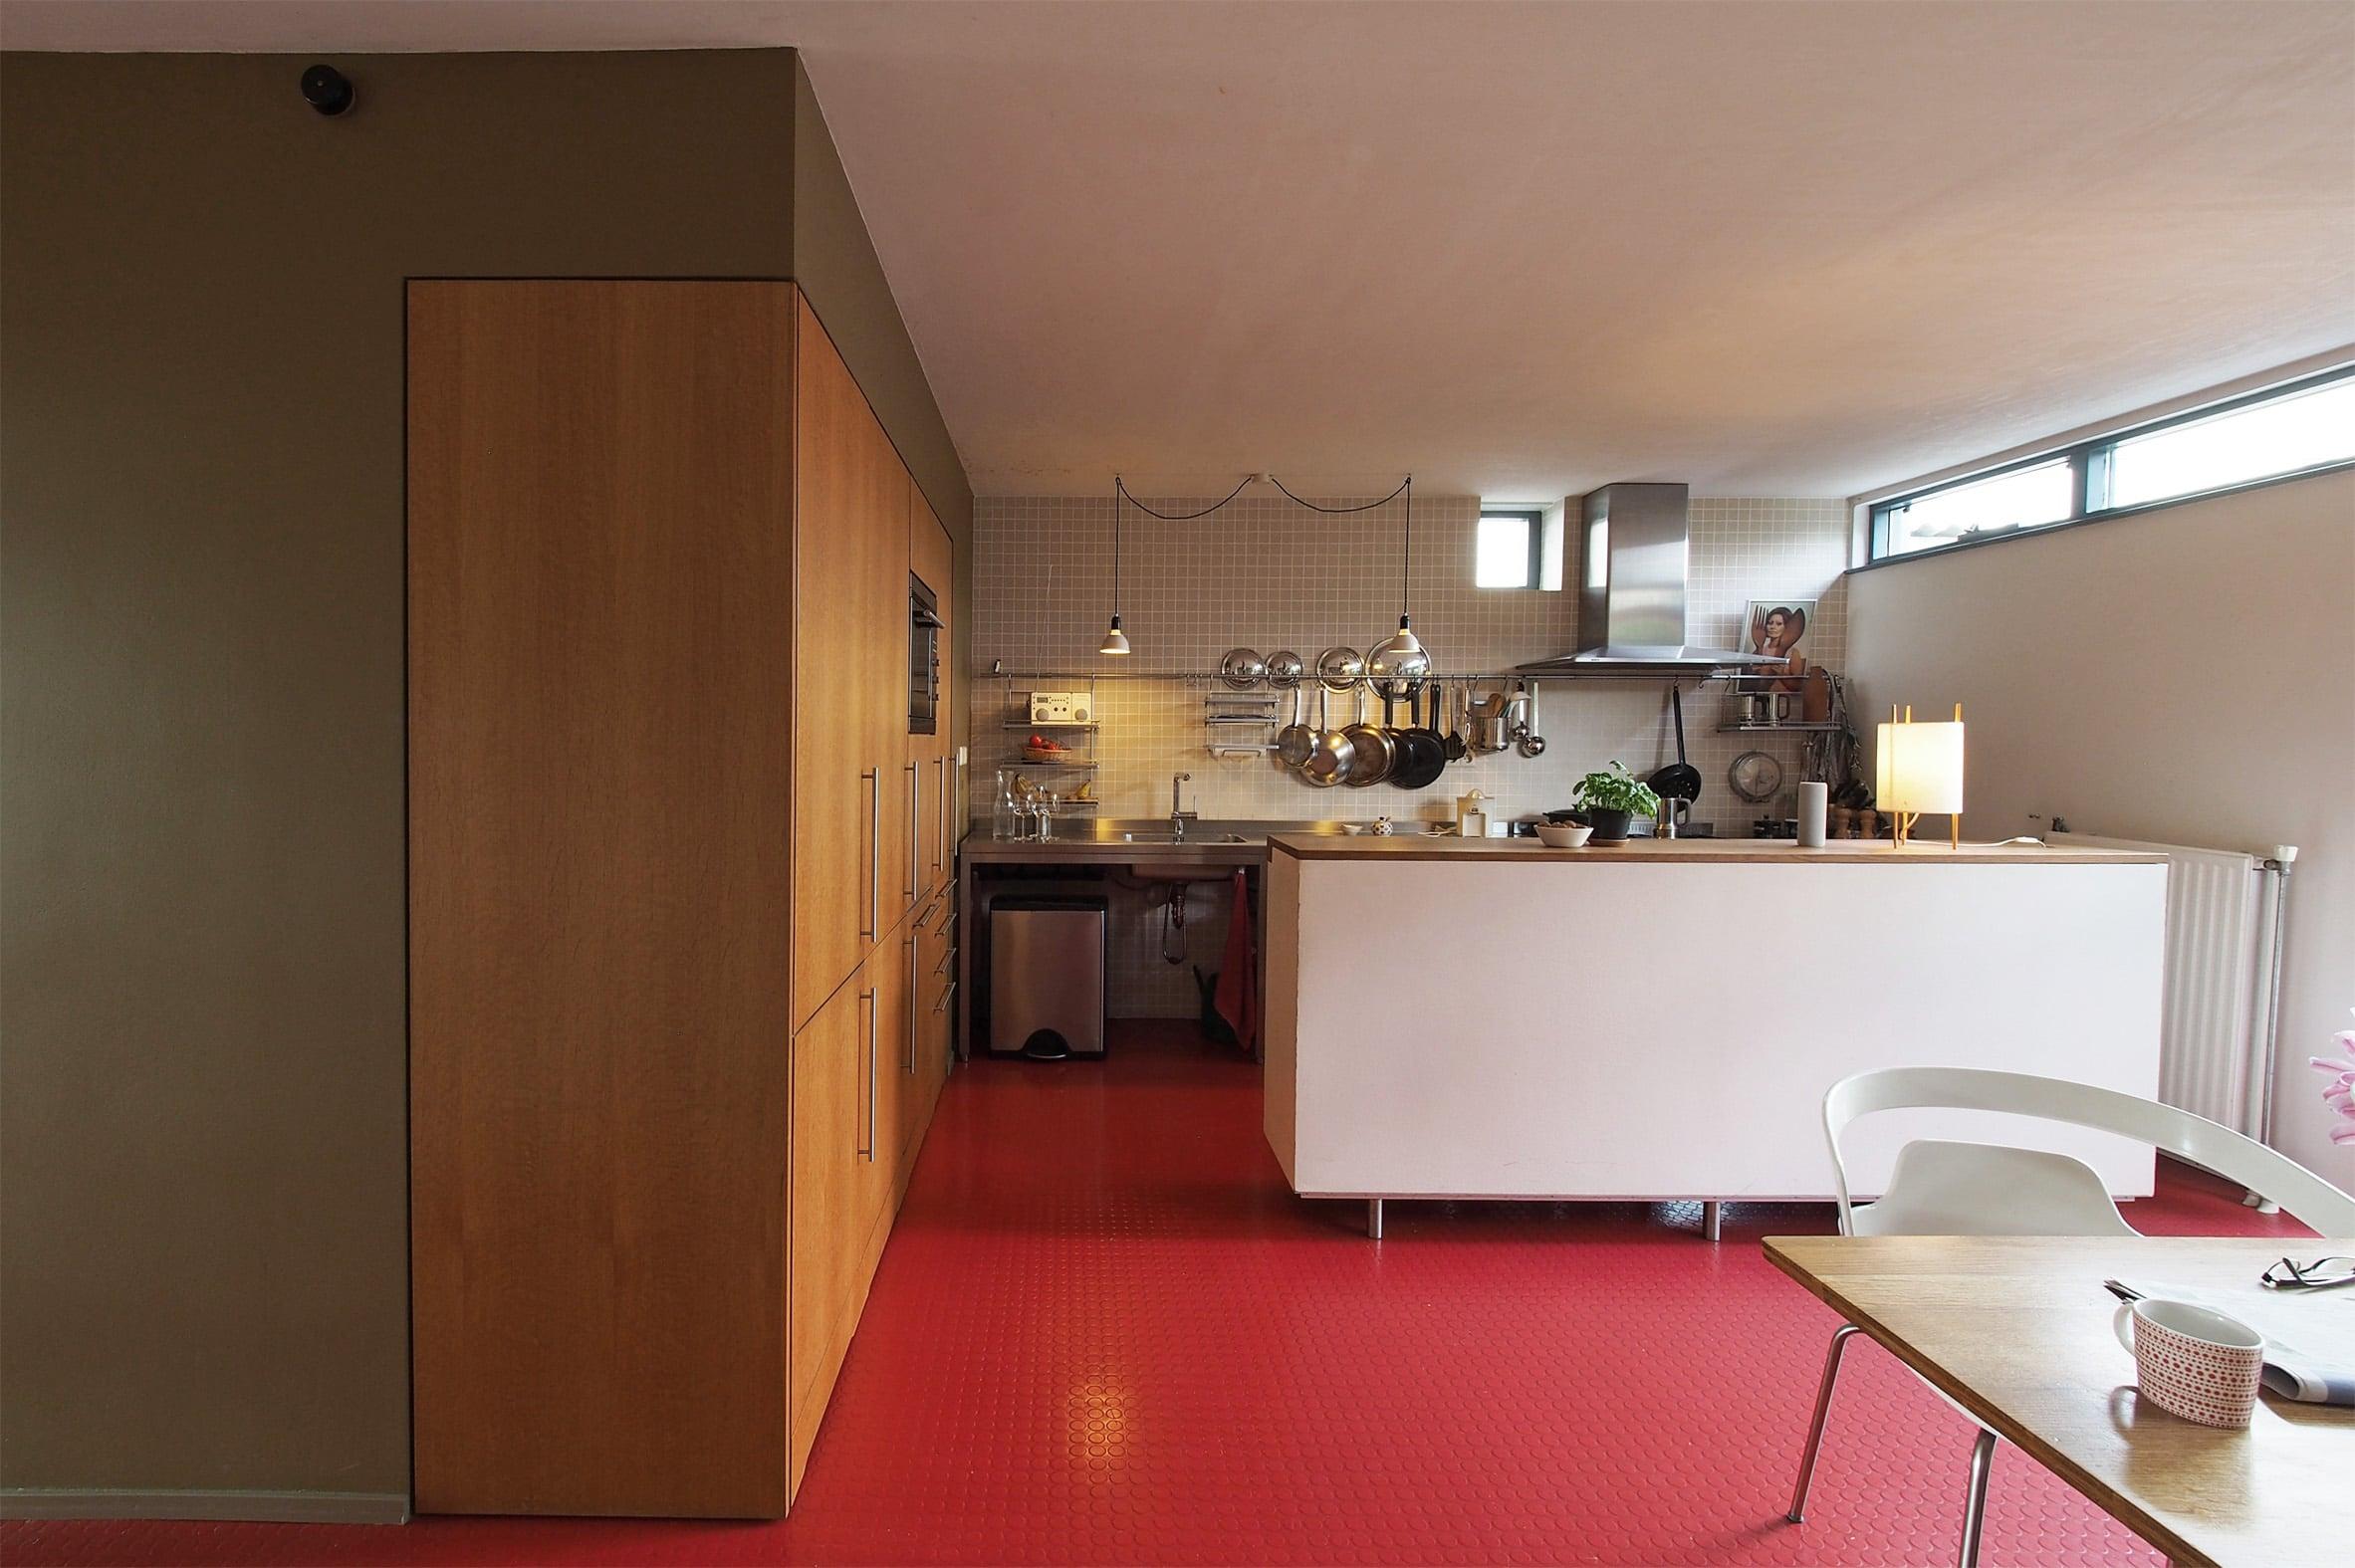 keuken Den Haag Bergblick interieurarchitectuur